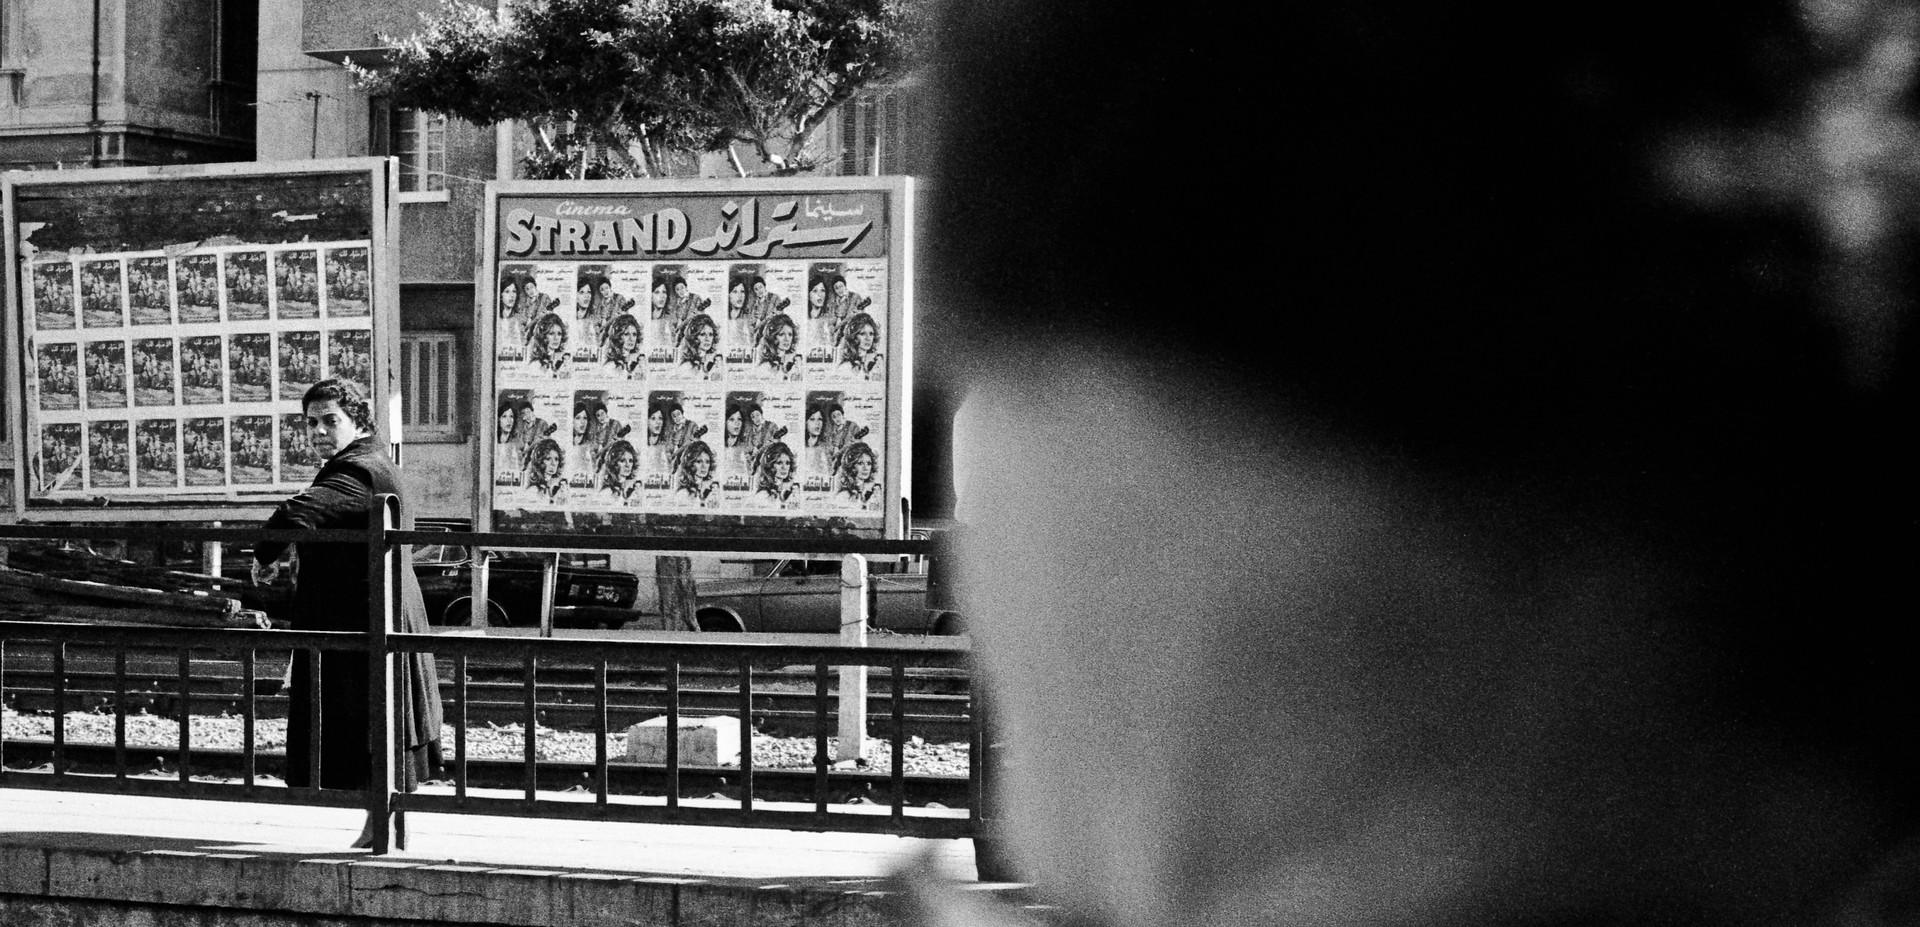 Alexandria, Egypt 1980